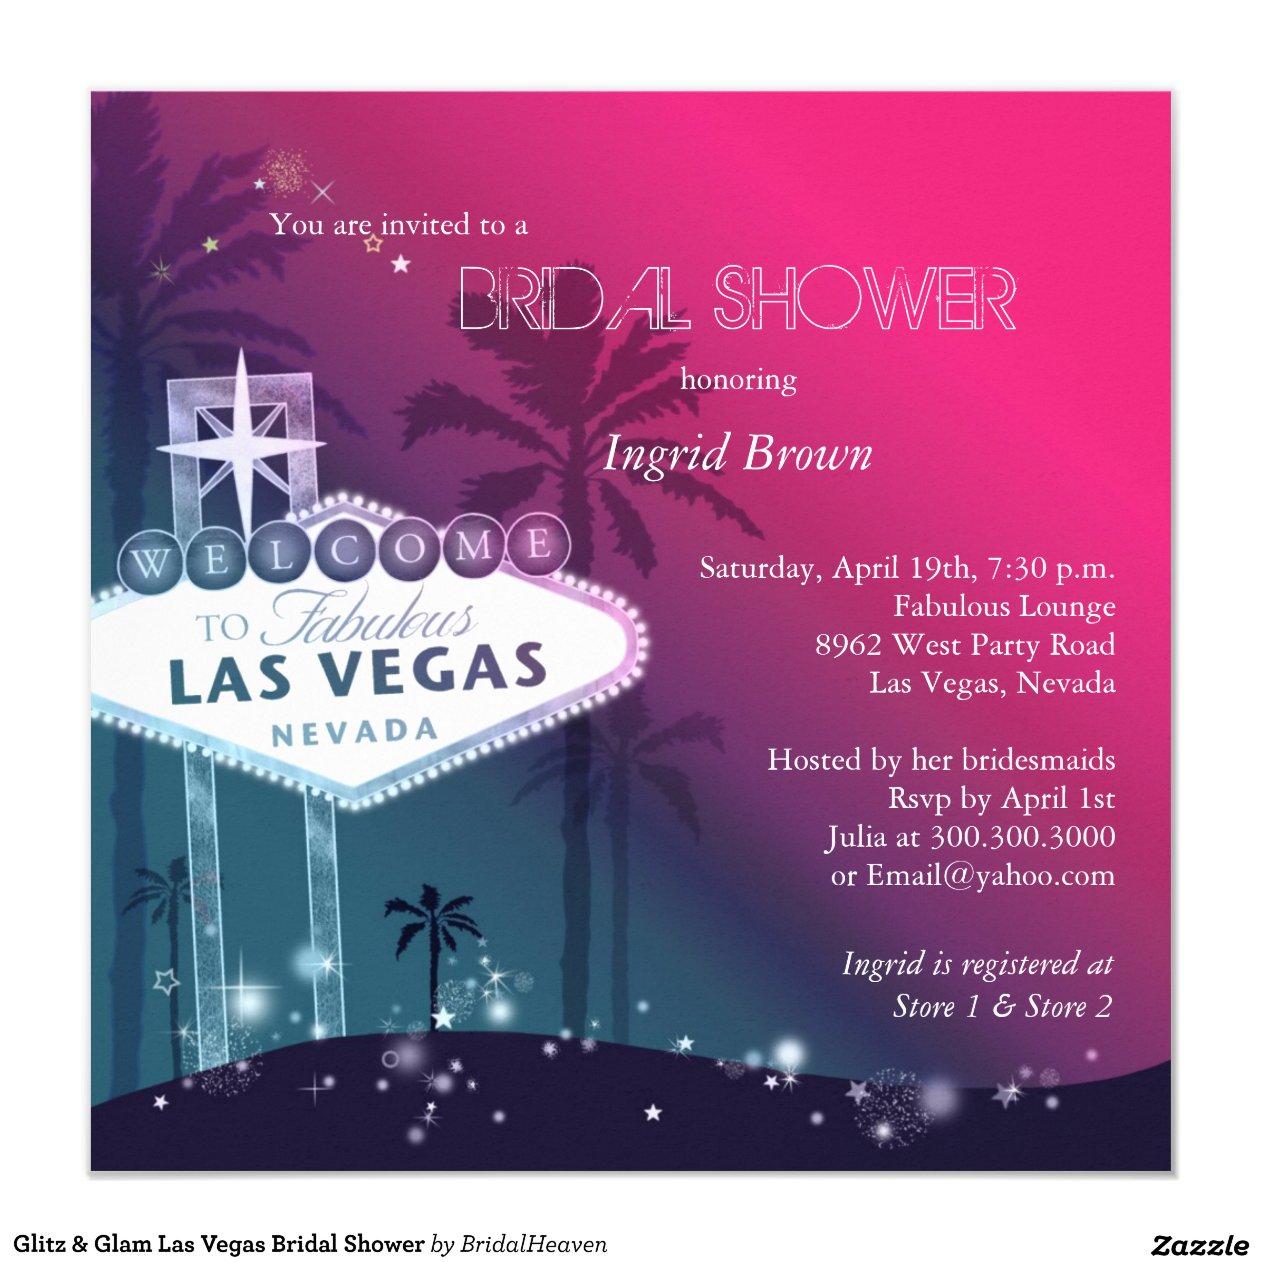 Las Vegas Bridal Shower Invitations 28 Images